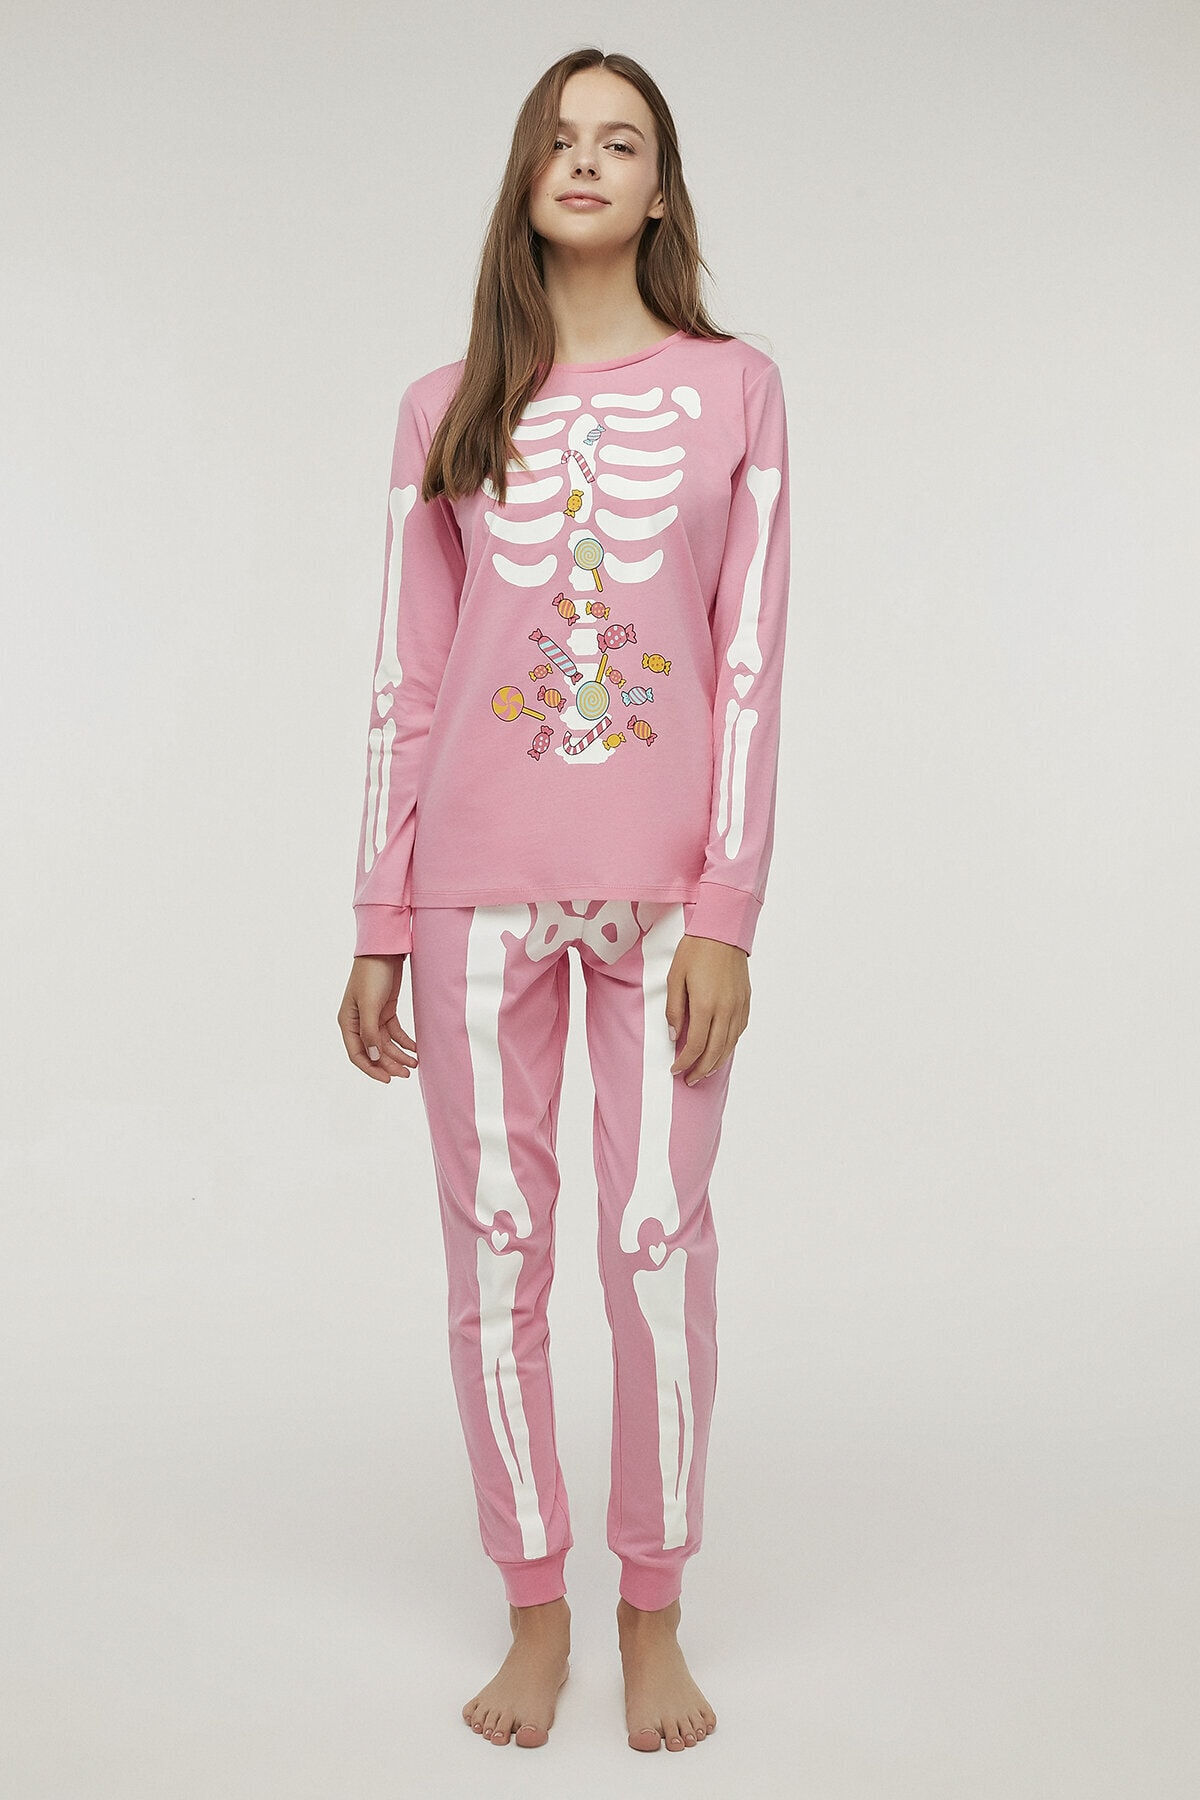 Penti Pembe Skeleton Pijama Takımı 2